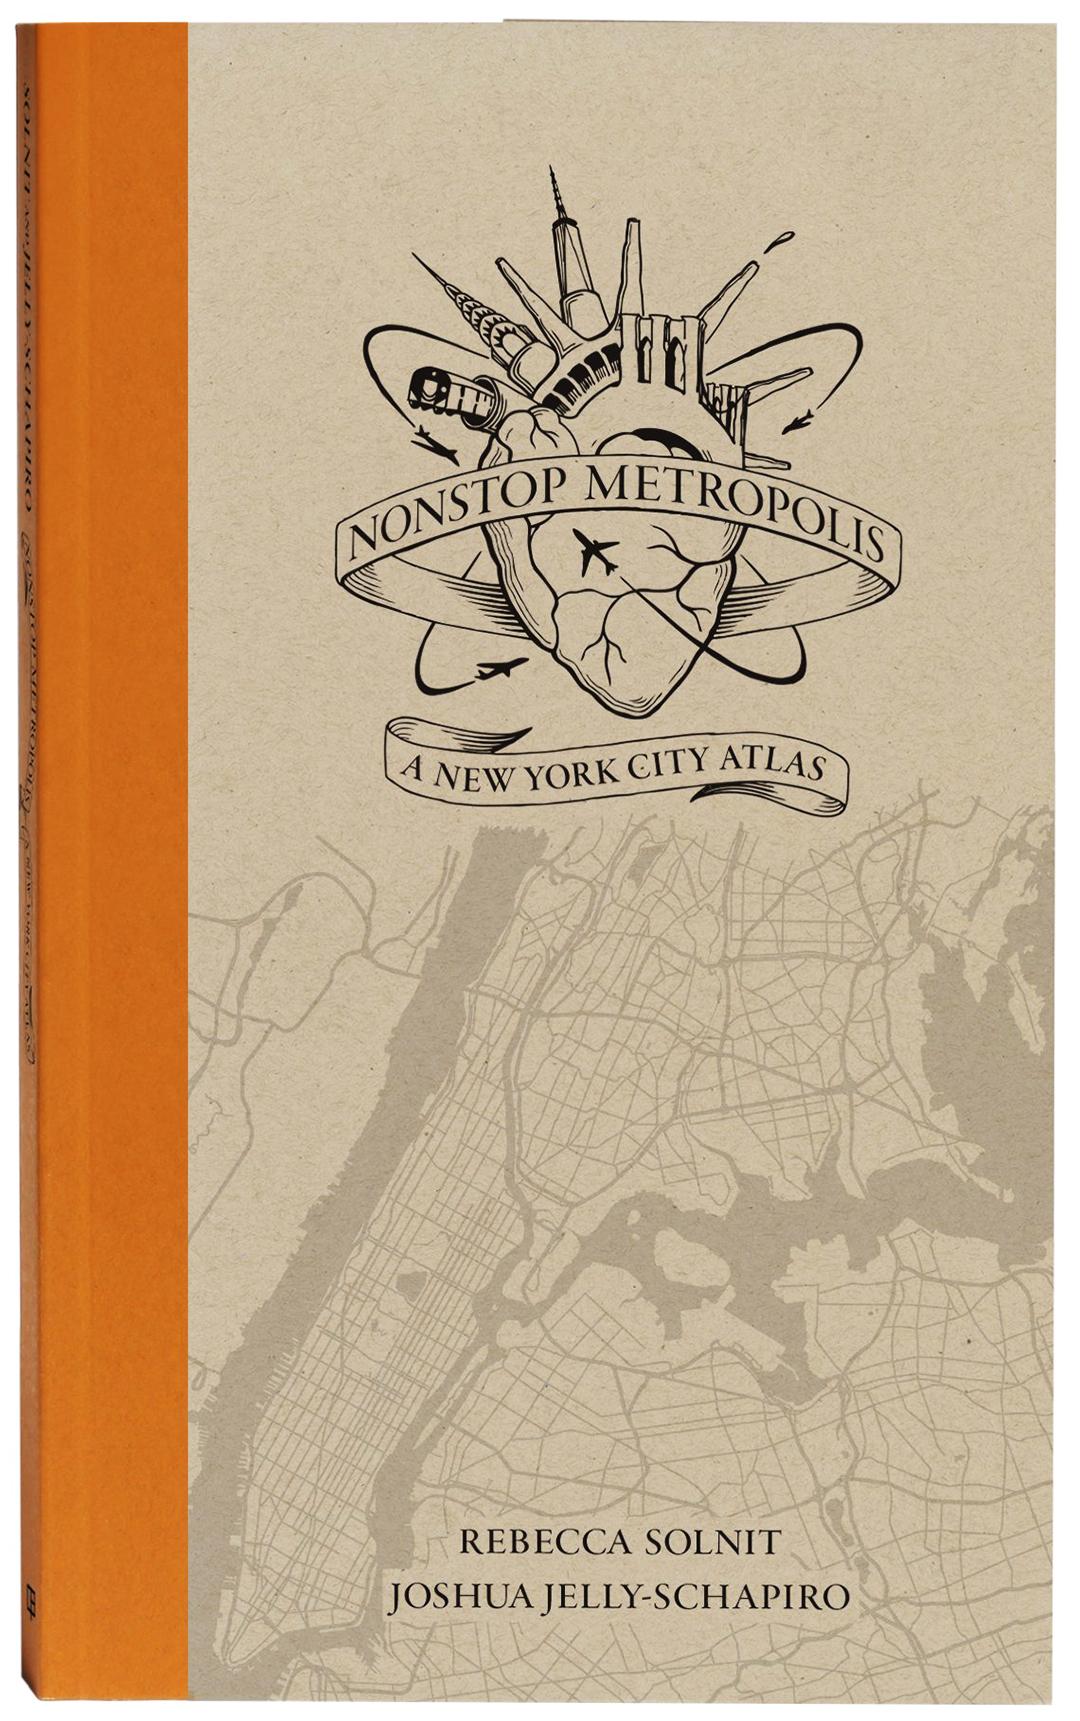 nonstop-metropolis-atlas.jpg